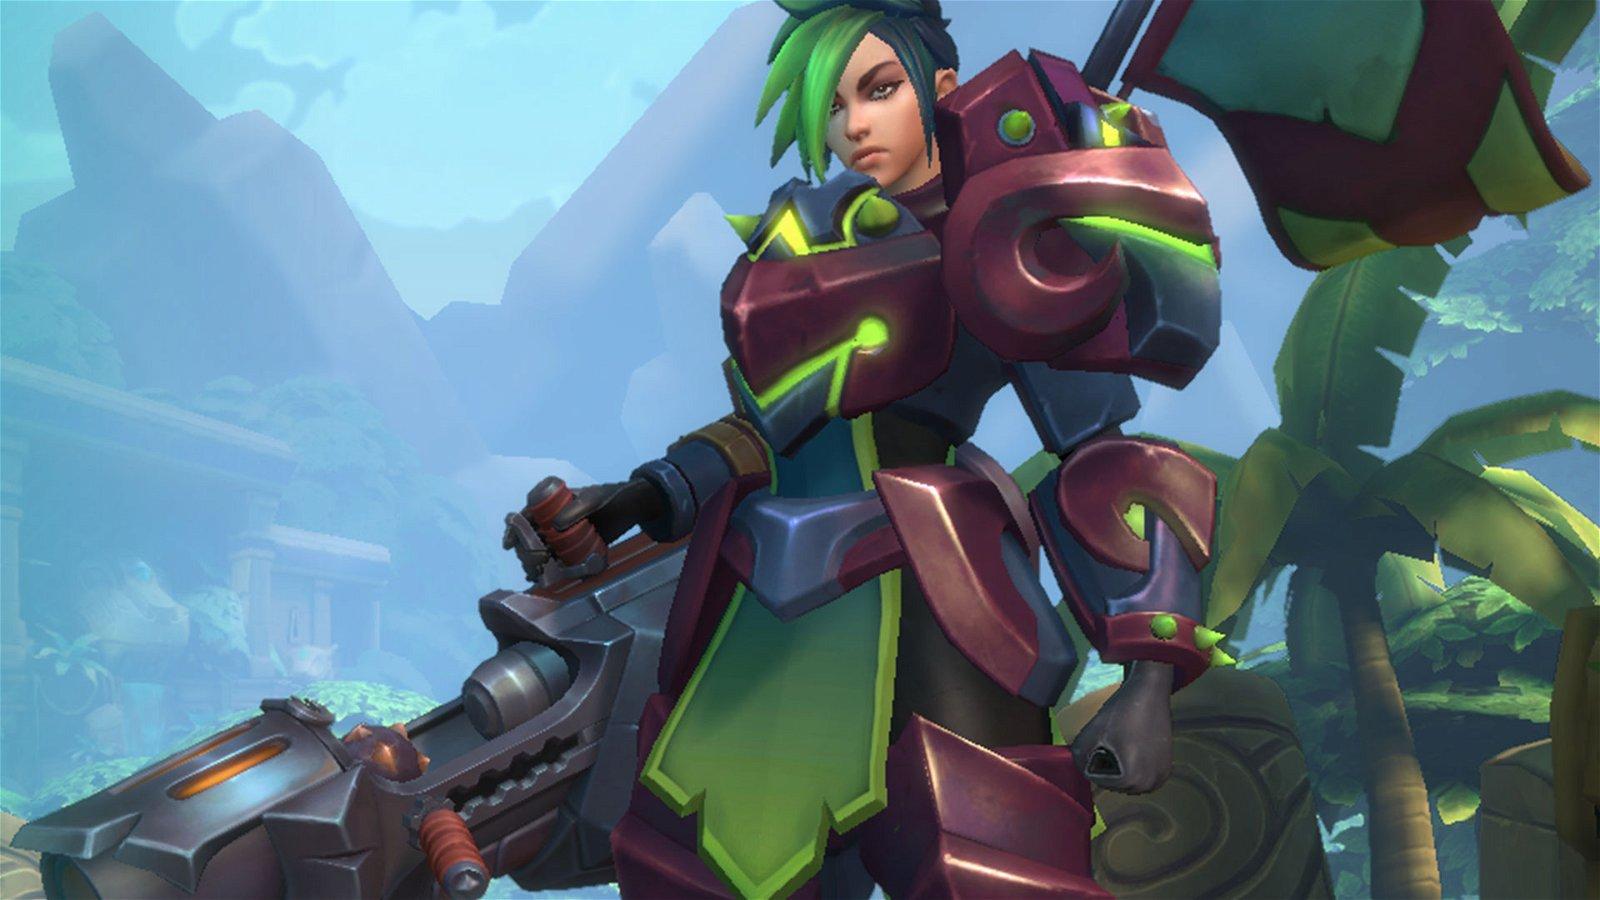 Hi-Rez Studios Adds New Champion, Ash For Paladins Beta